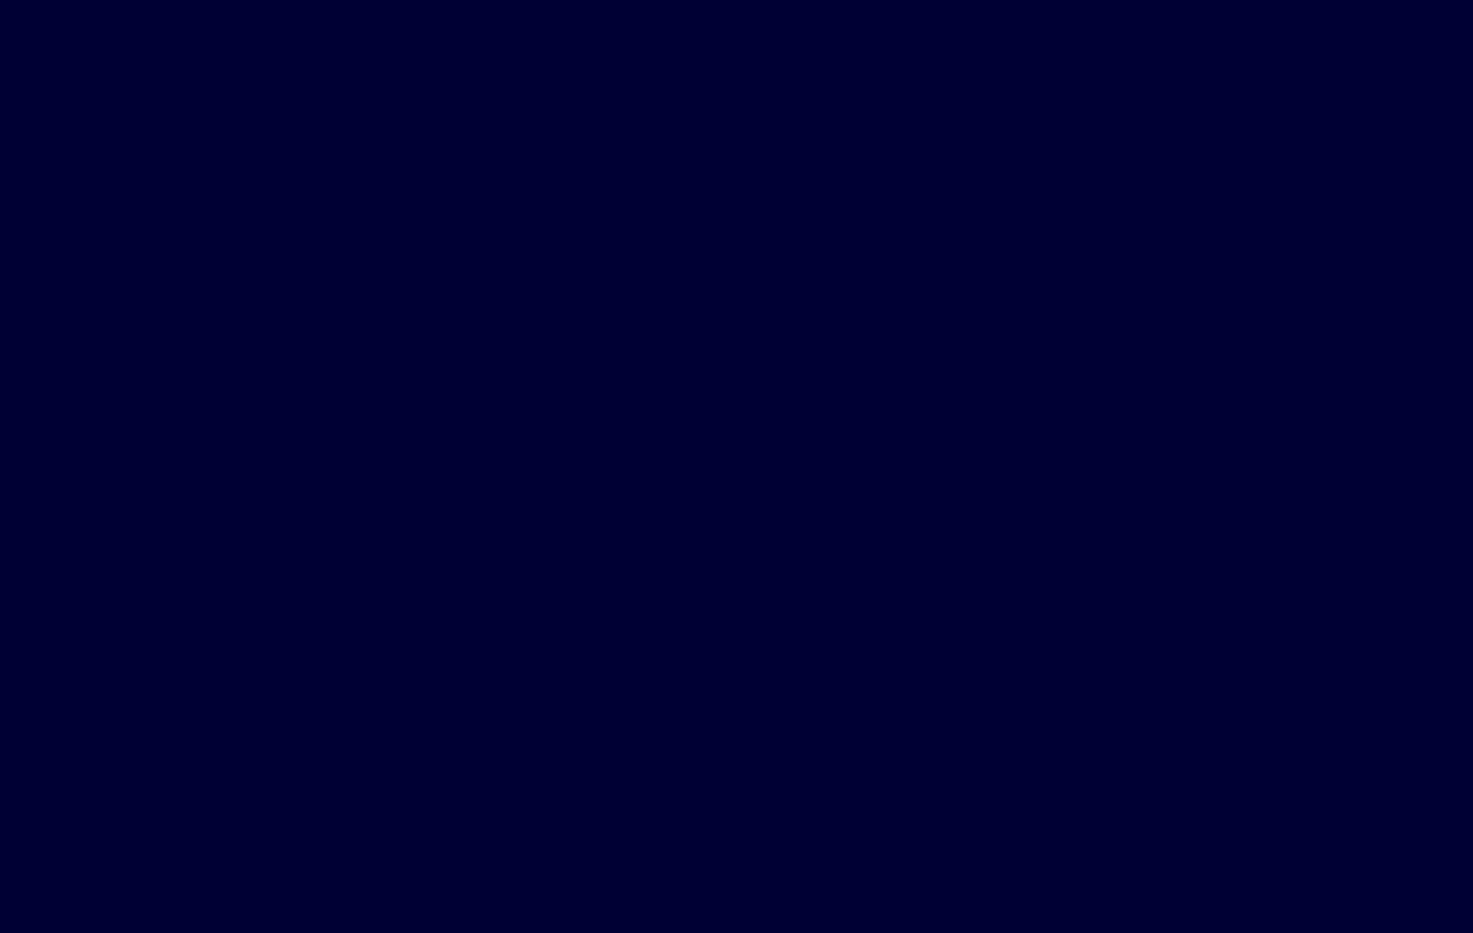 blu 919